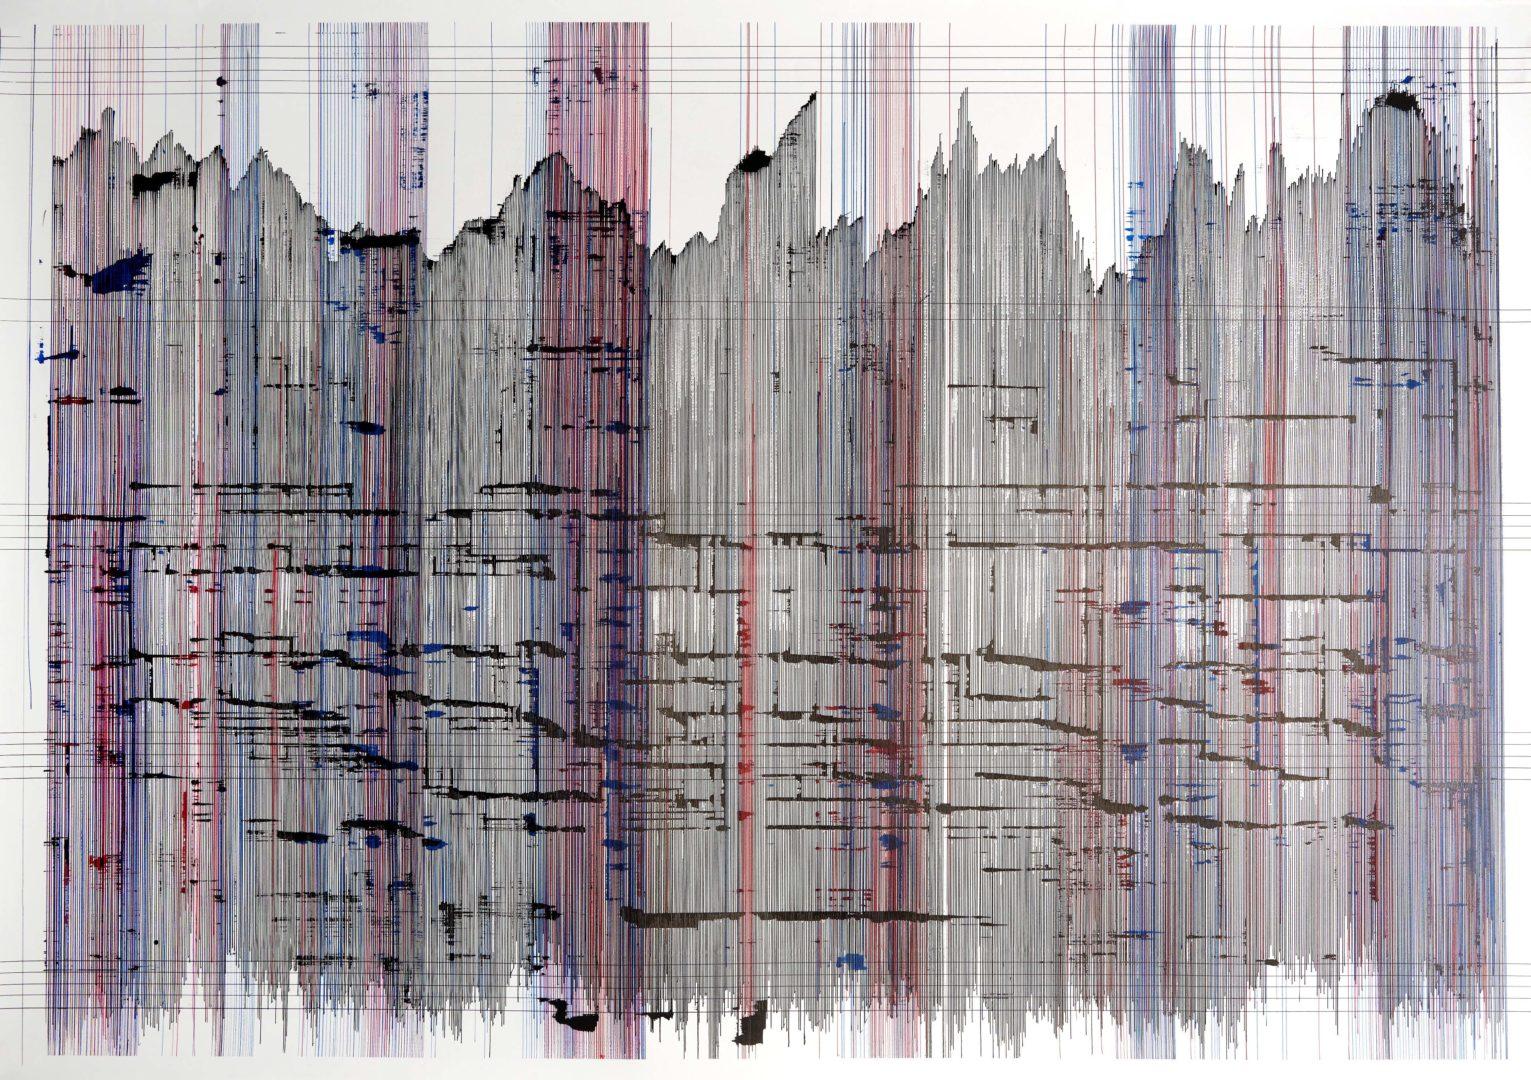 Op.300719. ink on paper. 95x136cm